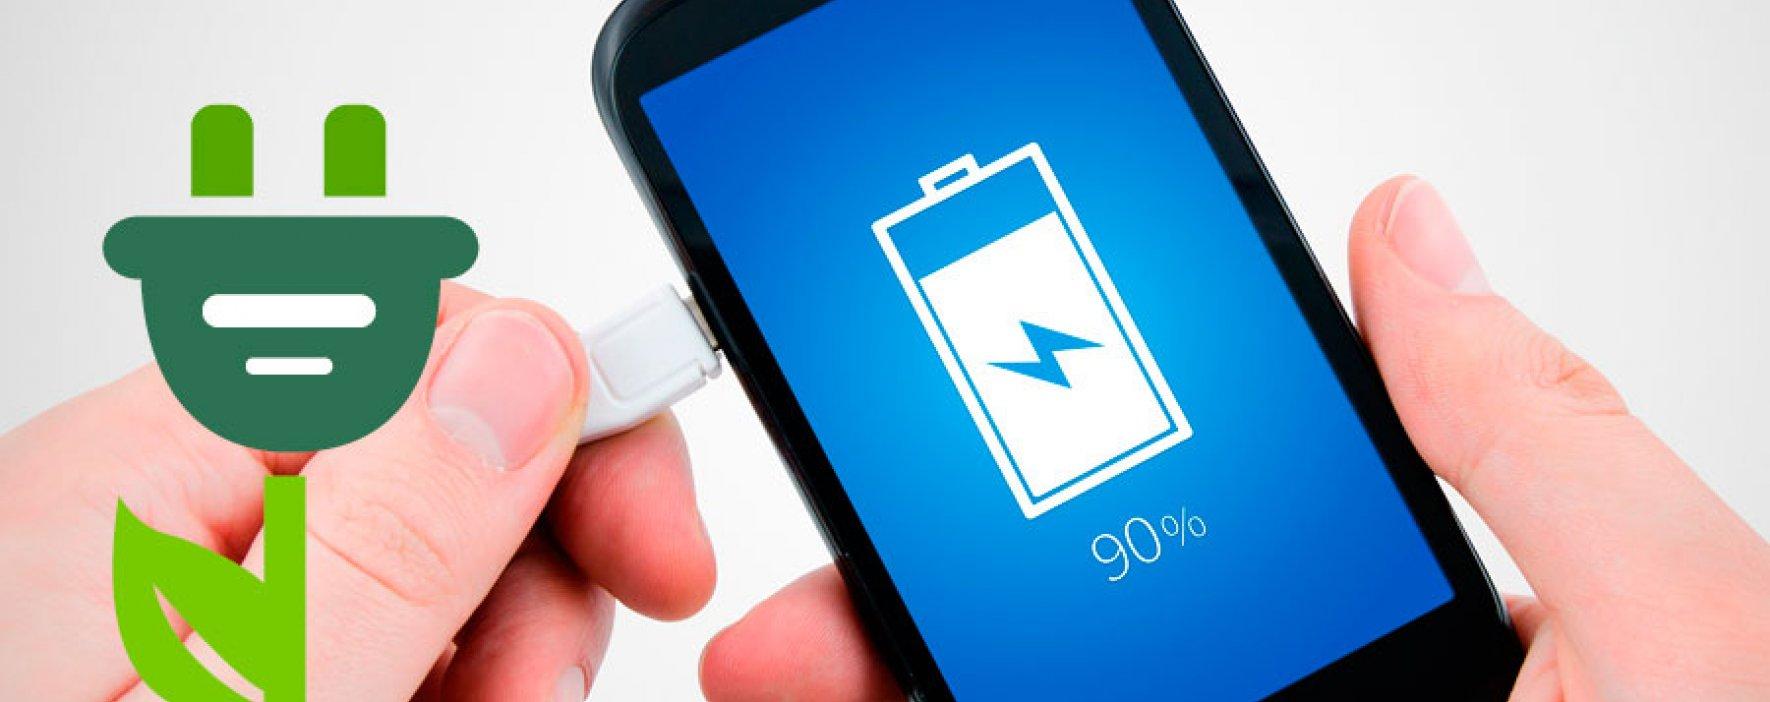 Materas que cargan la batería de un celular